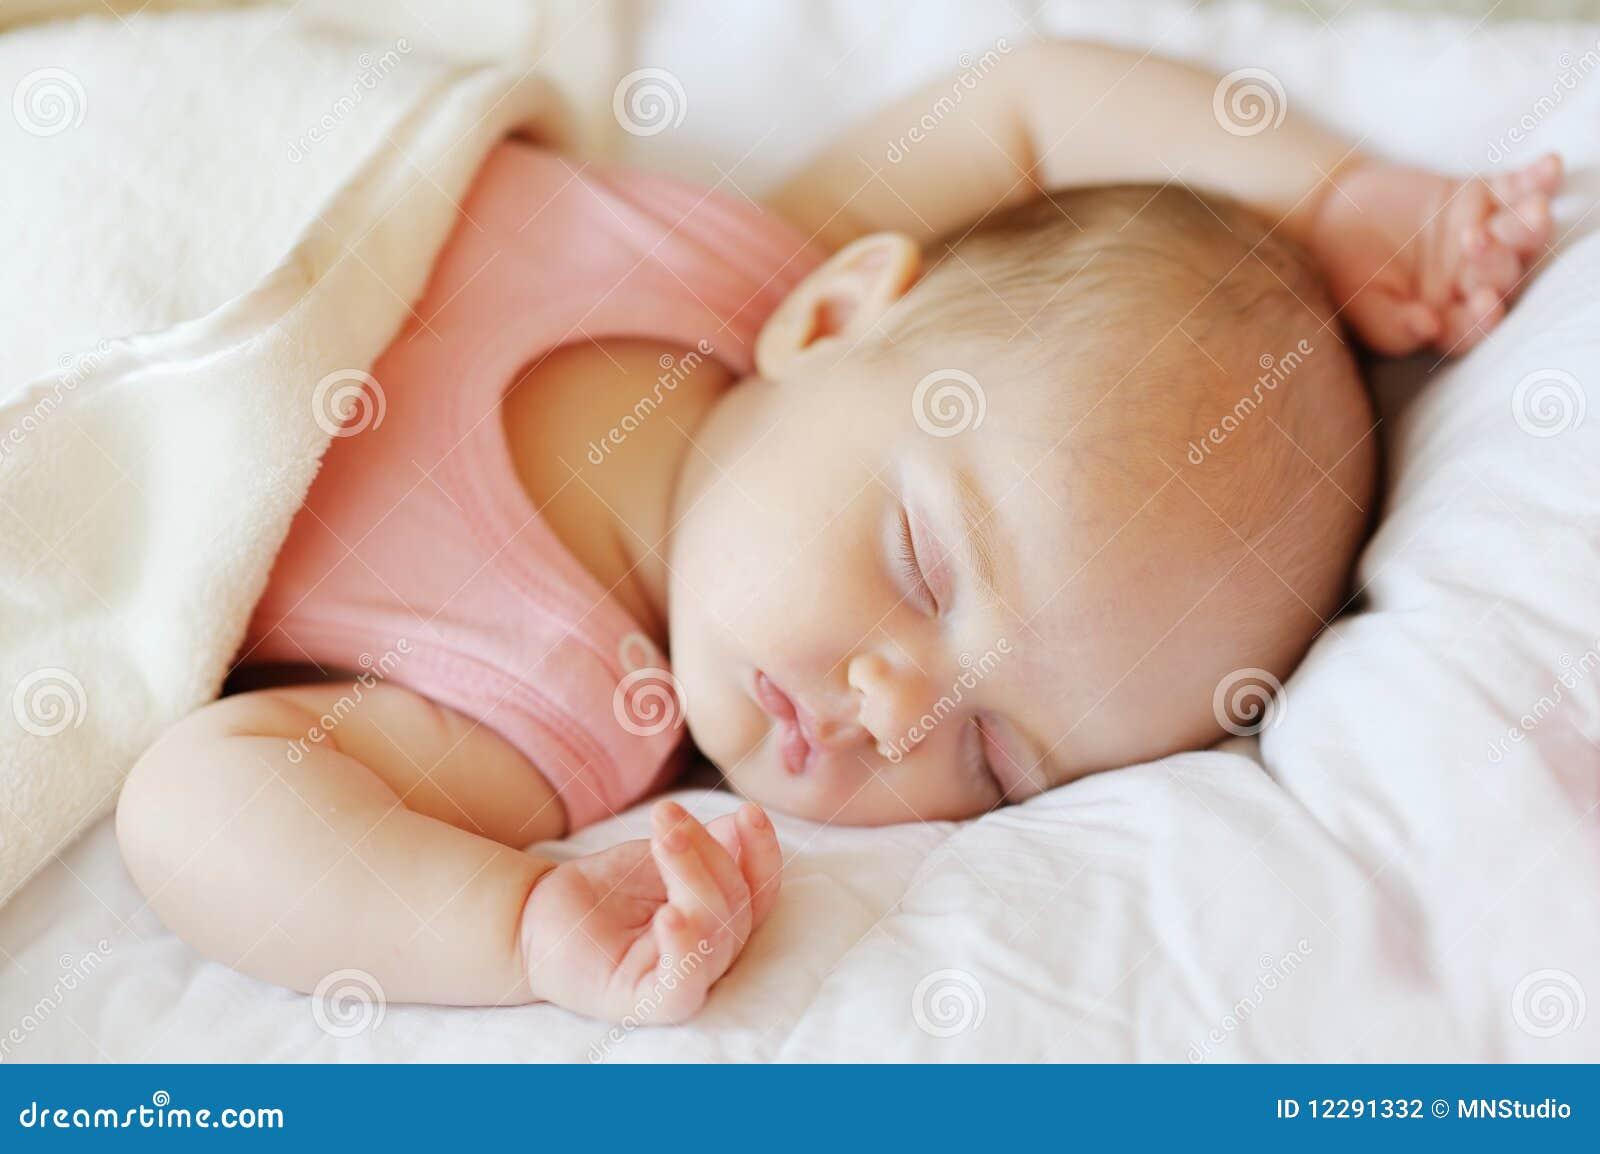 Baby bed newborn - Sweet Little Newborn Baby In A Bed